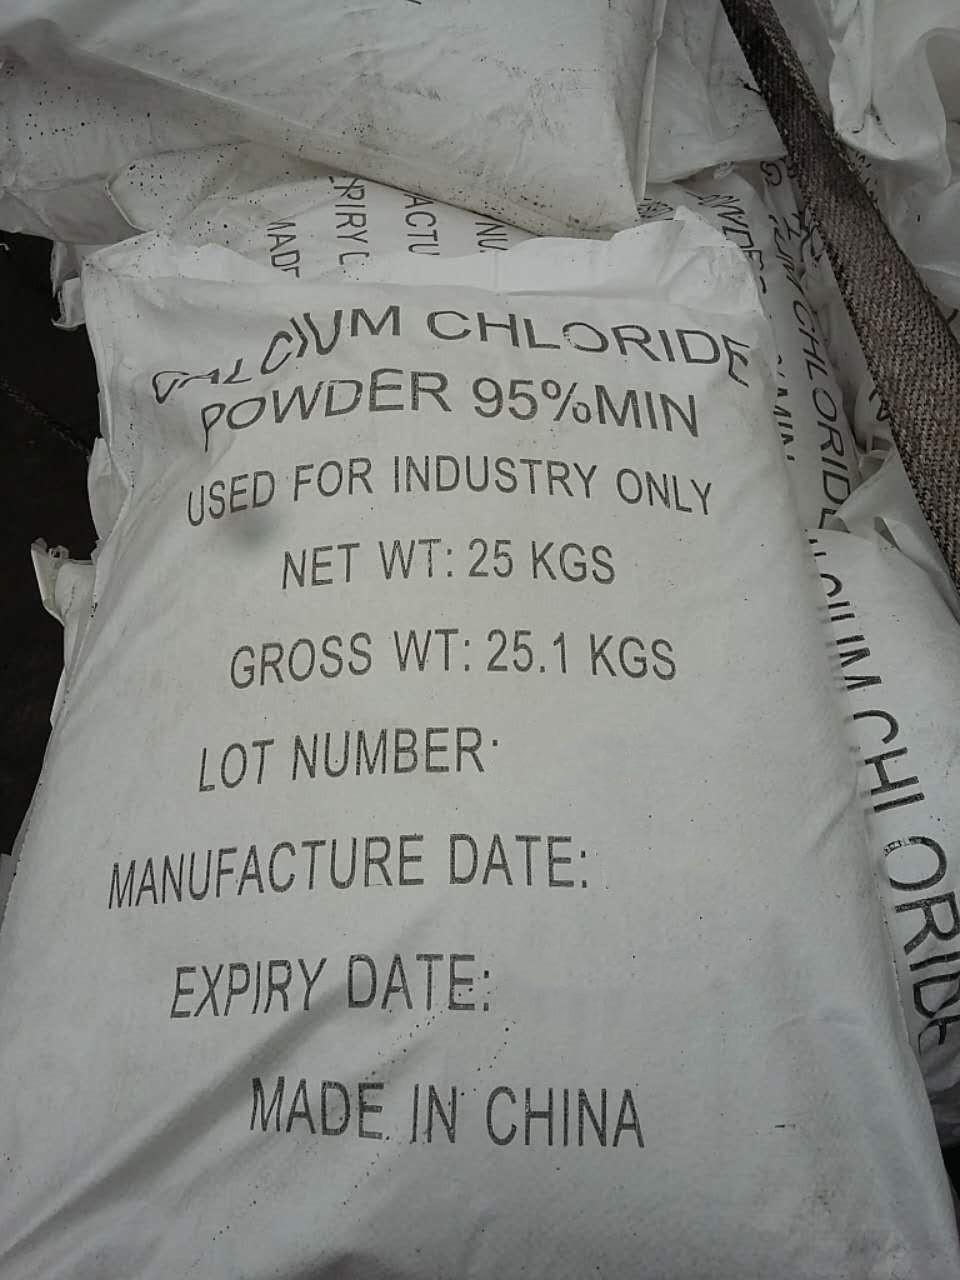 calcium chloride 95%min powder 1